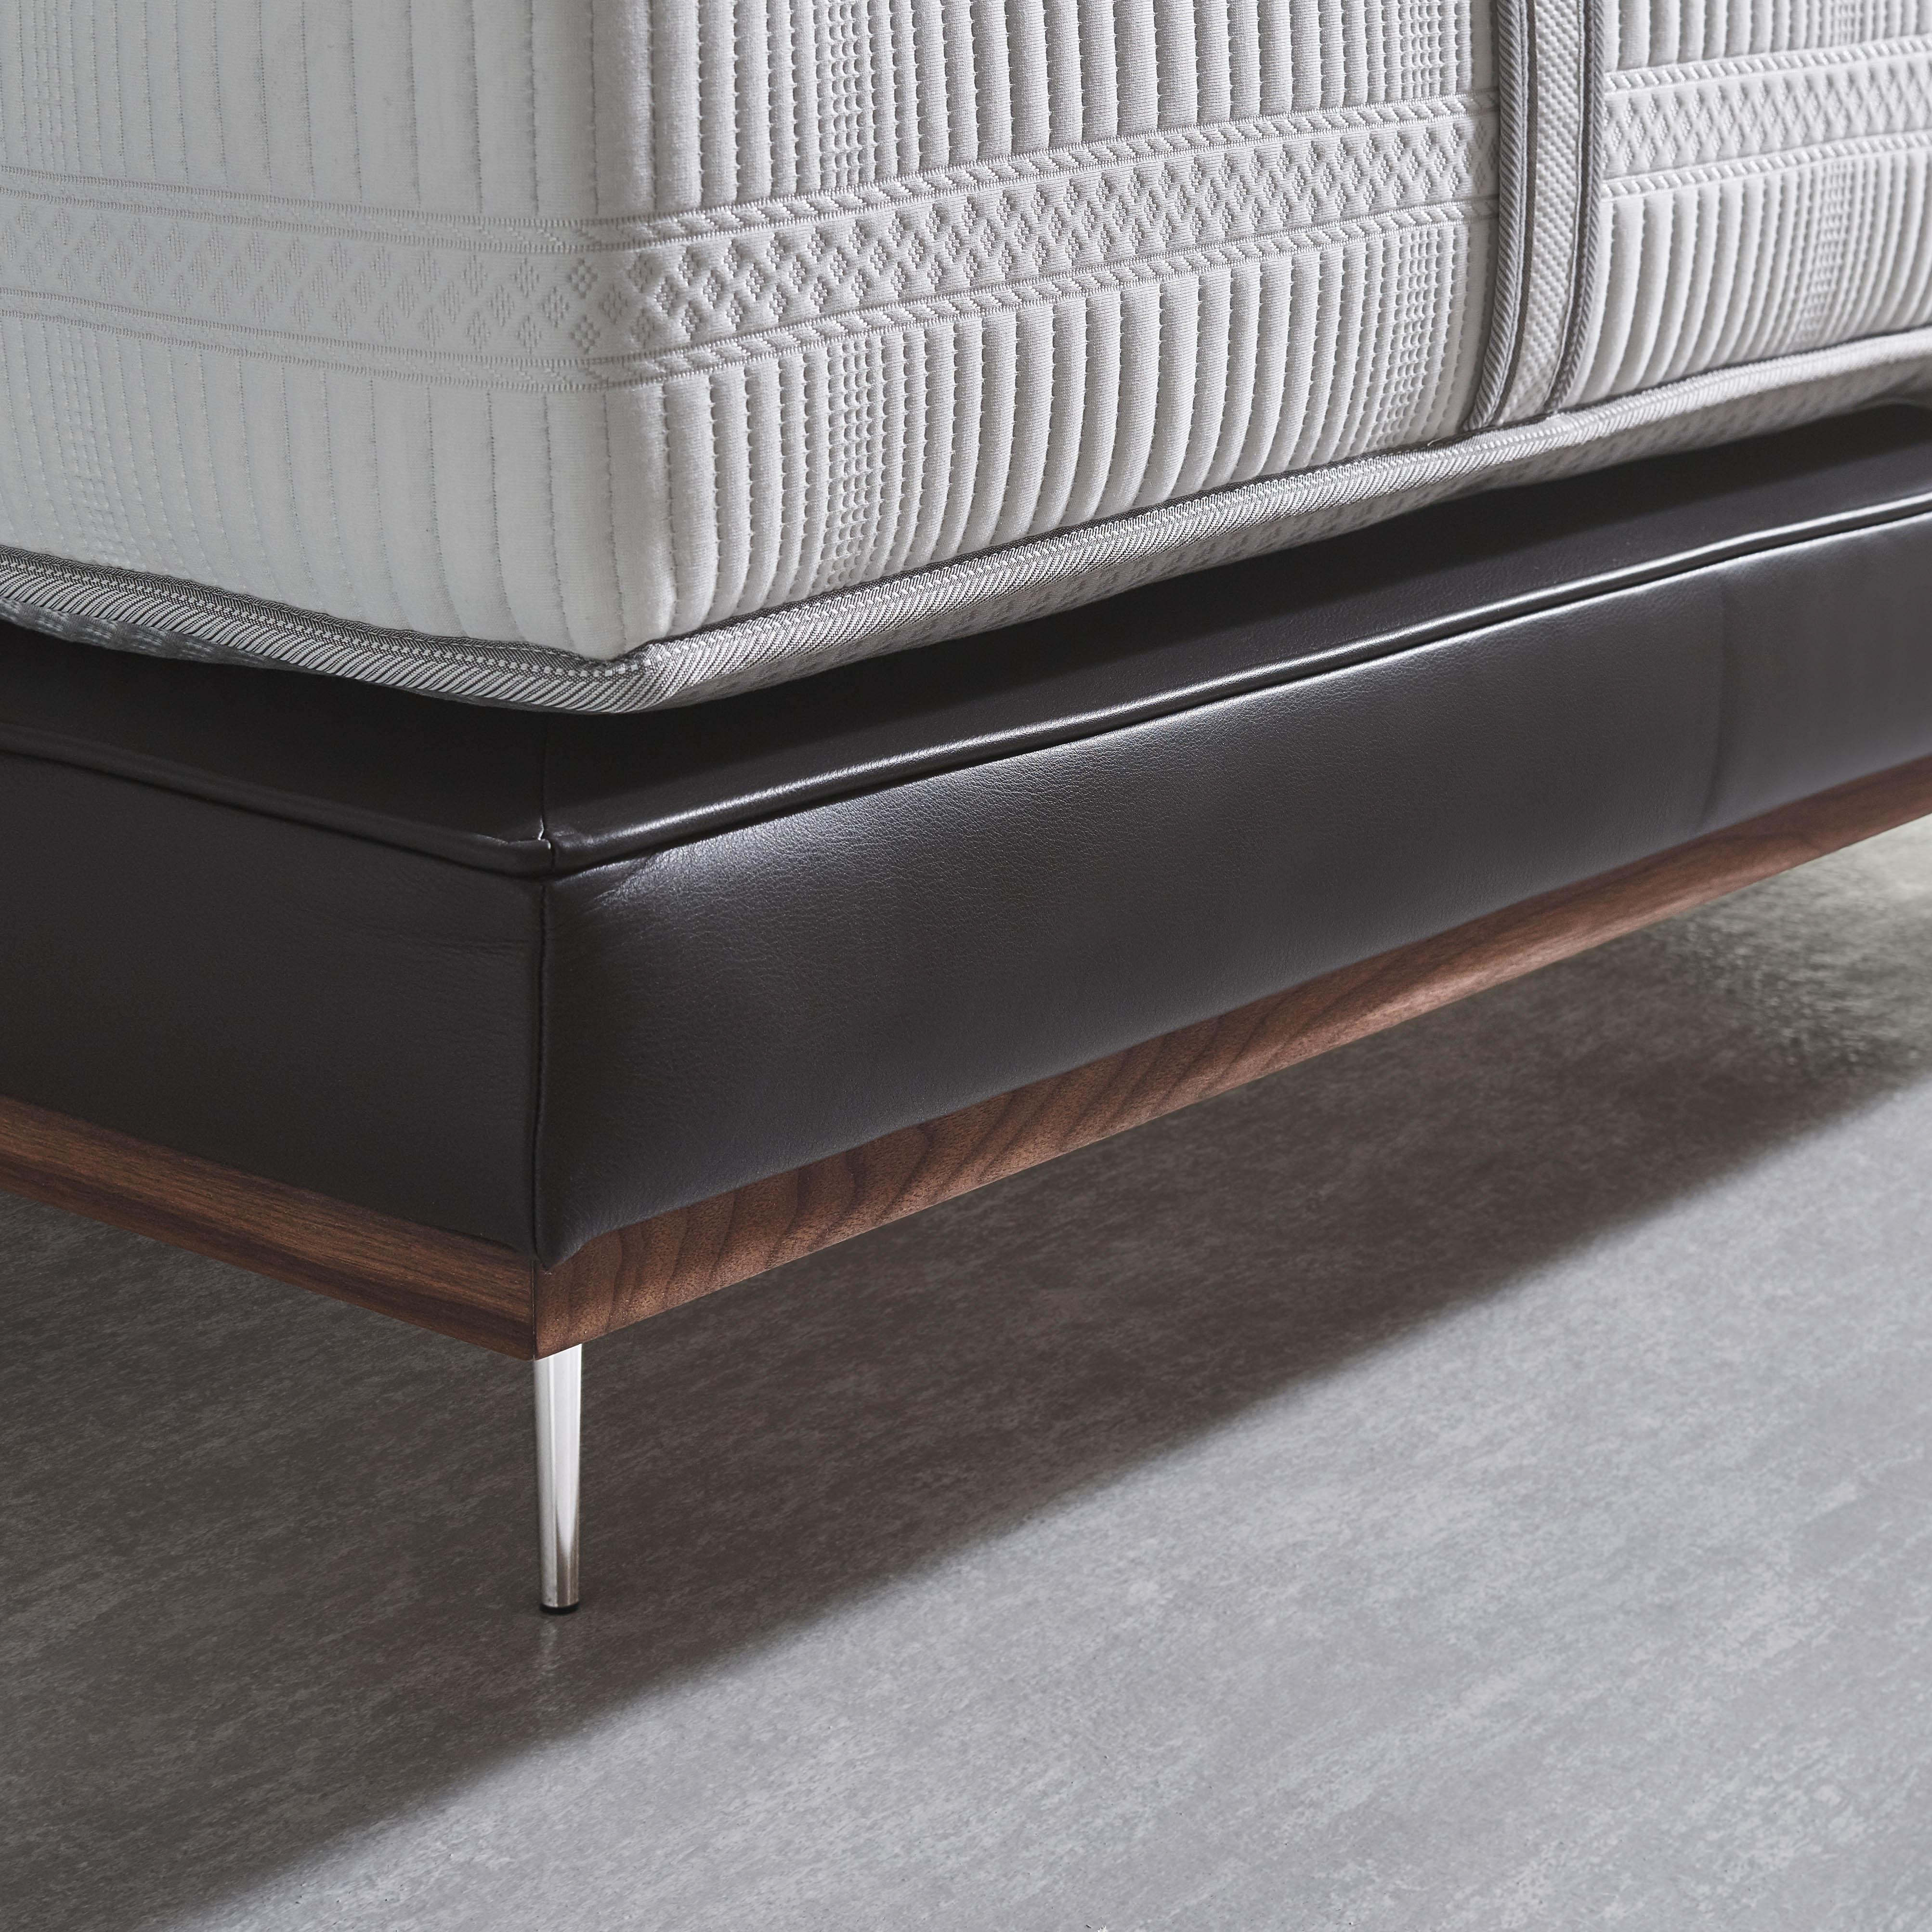 bed thea austrian furniture industry. Black Bedroom Furniture Sets. Home Design Ideas